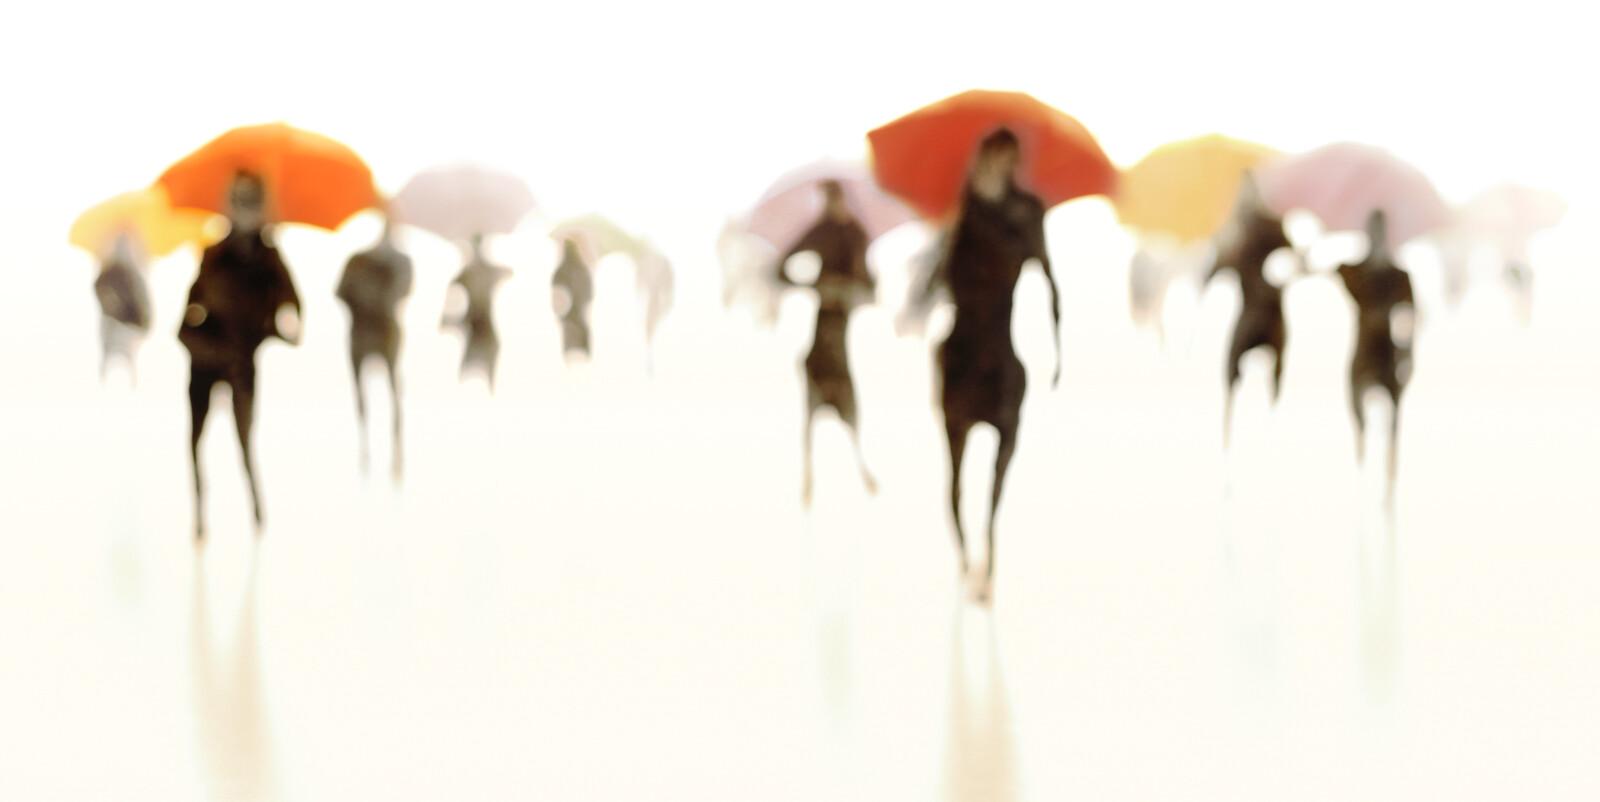 Umbrellas IV - Joerg Maxzin